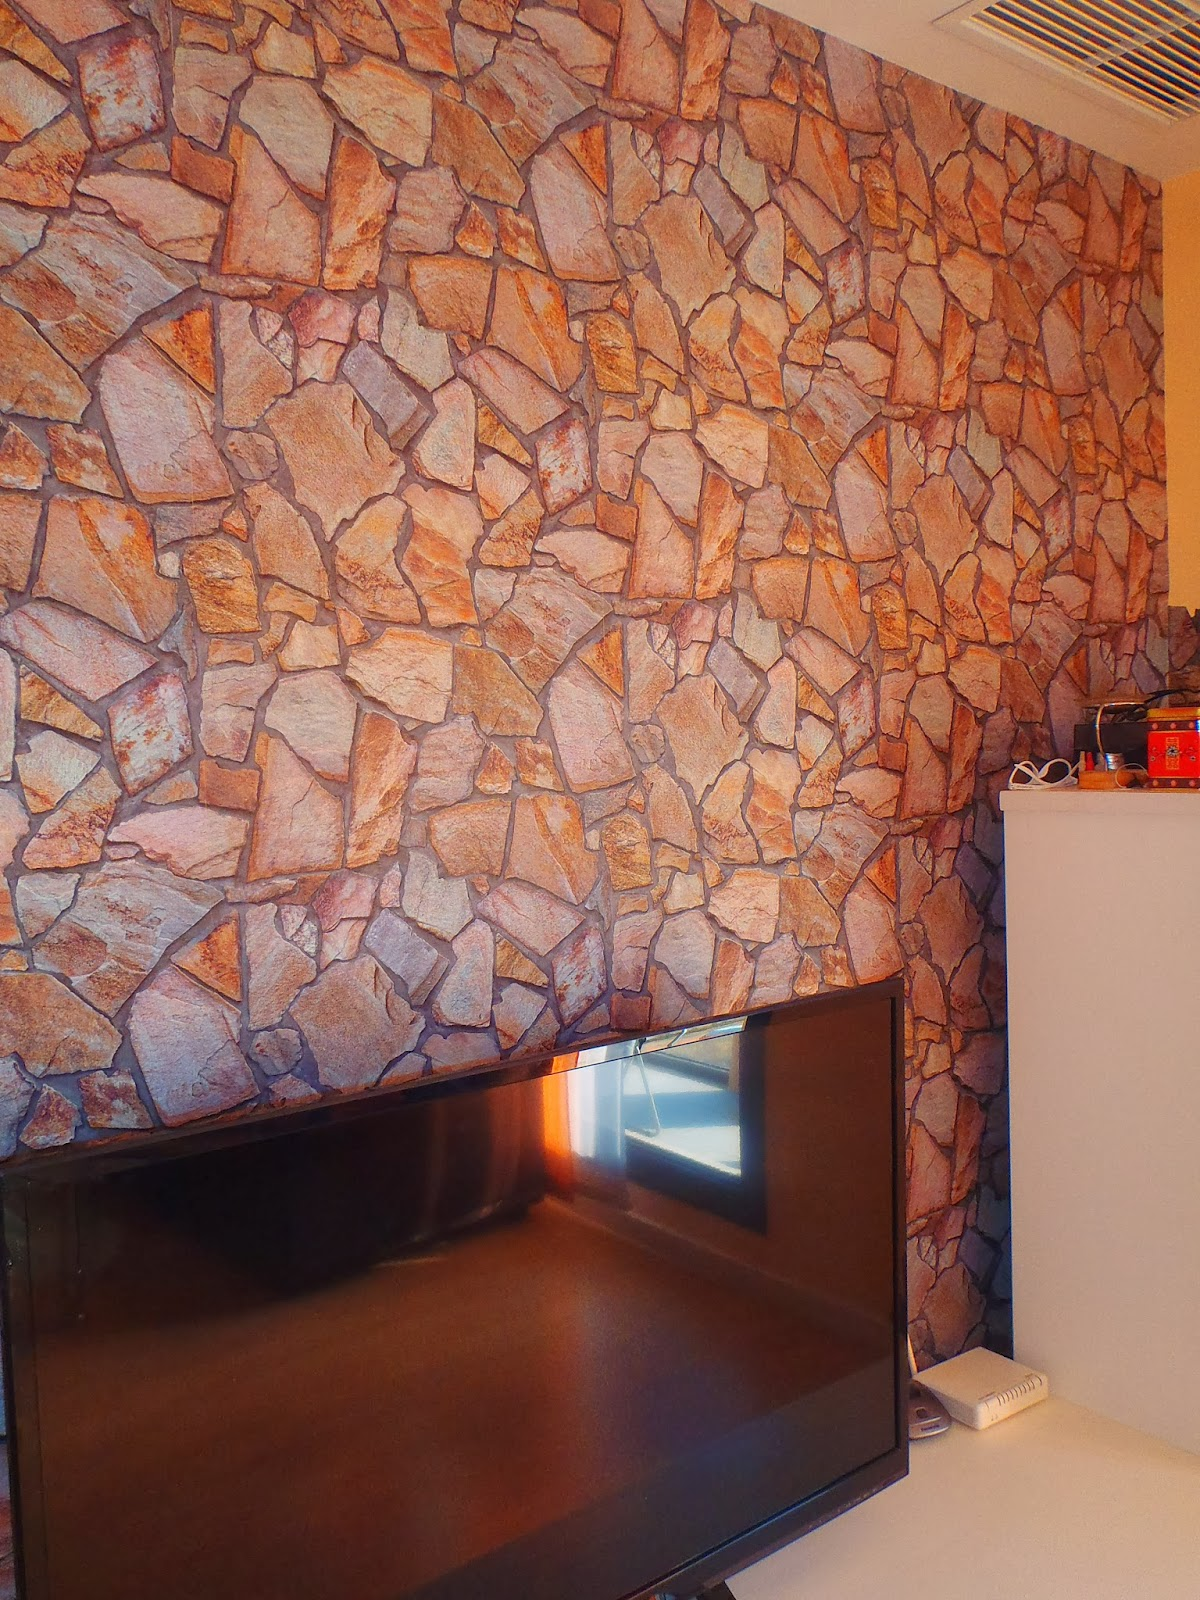 Pinturas ngel zaragoza papel pintado imitaci n piedra for Papel pintado zaragoza